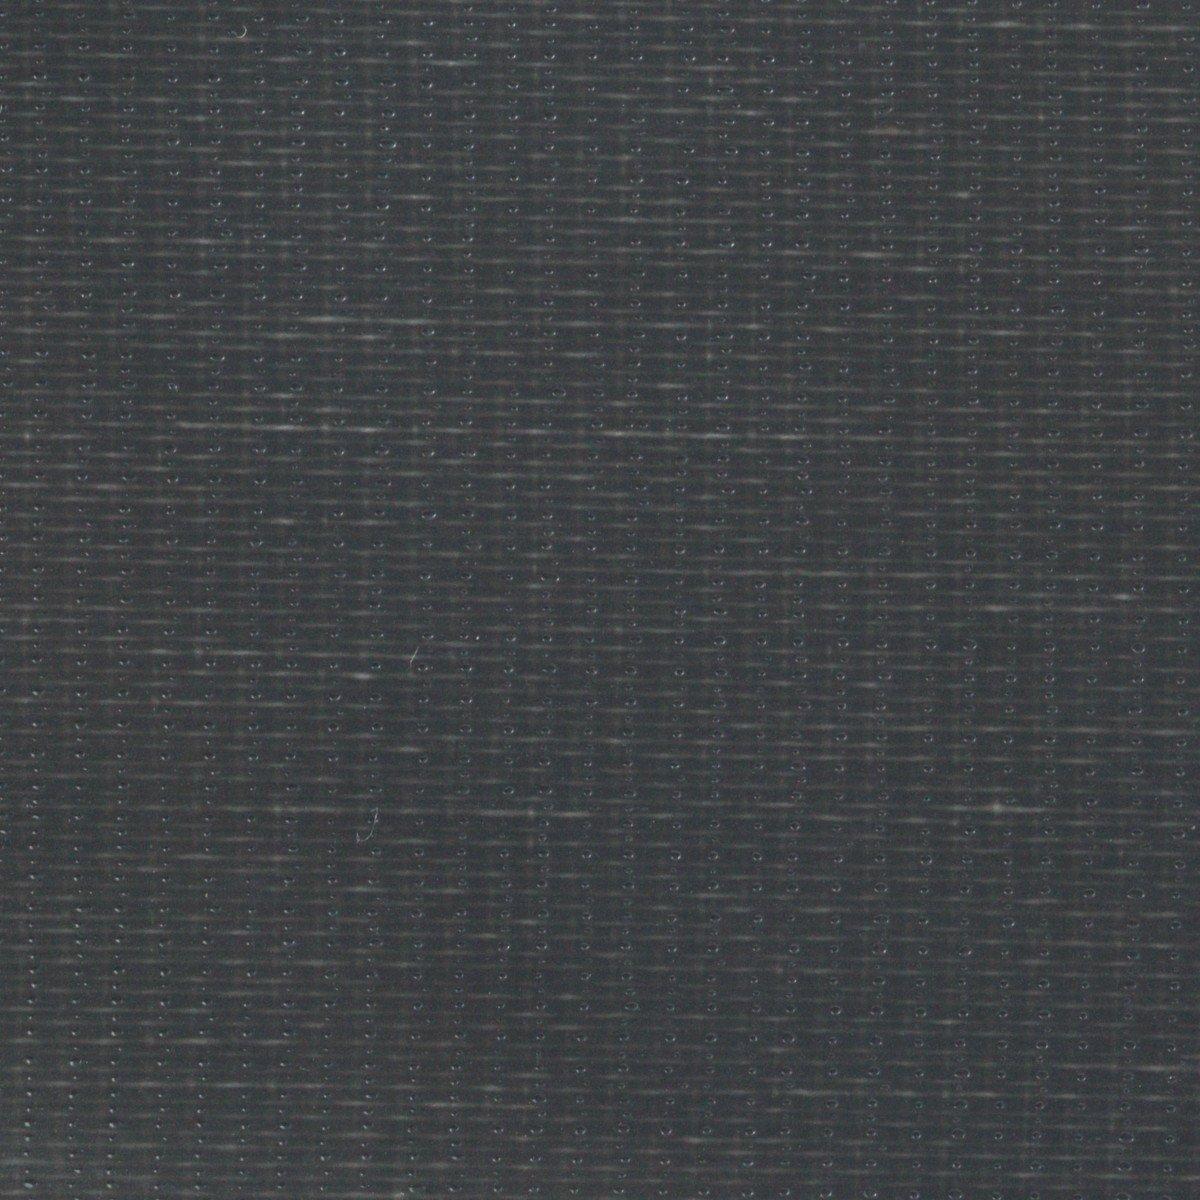 T-REX Ferociously Strong Duct Tape, 6 Rolls, Each 1.88 in. x 35 yd, Dark Gunmetal Gray (284976) by T-Rex (Image #7)